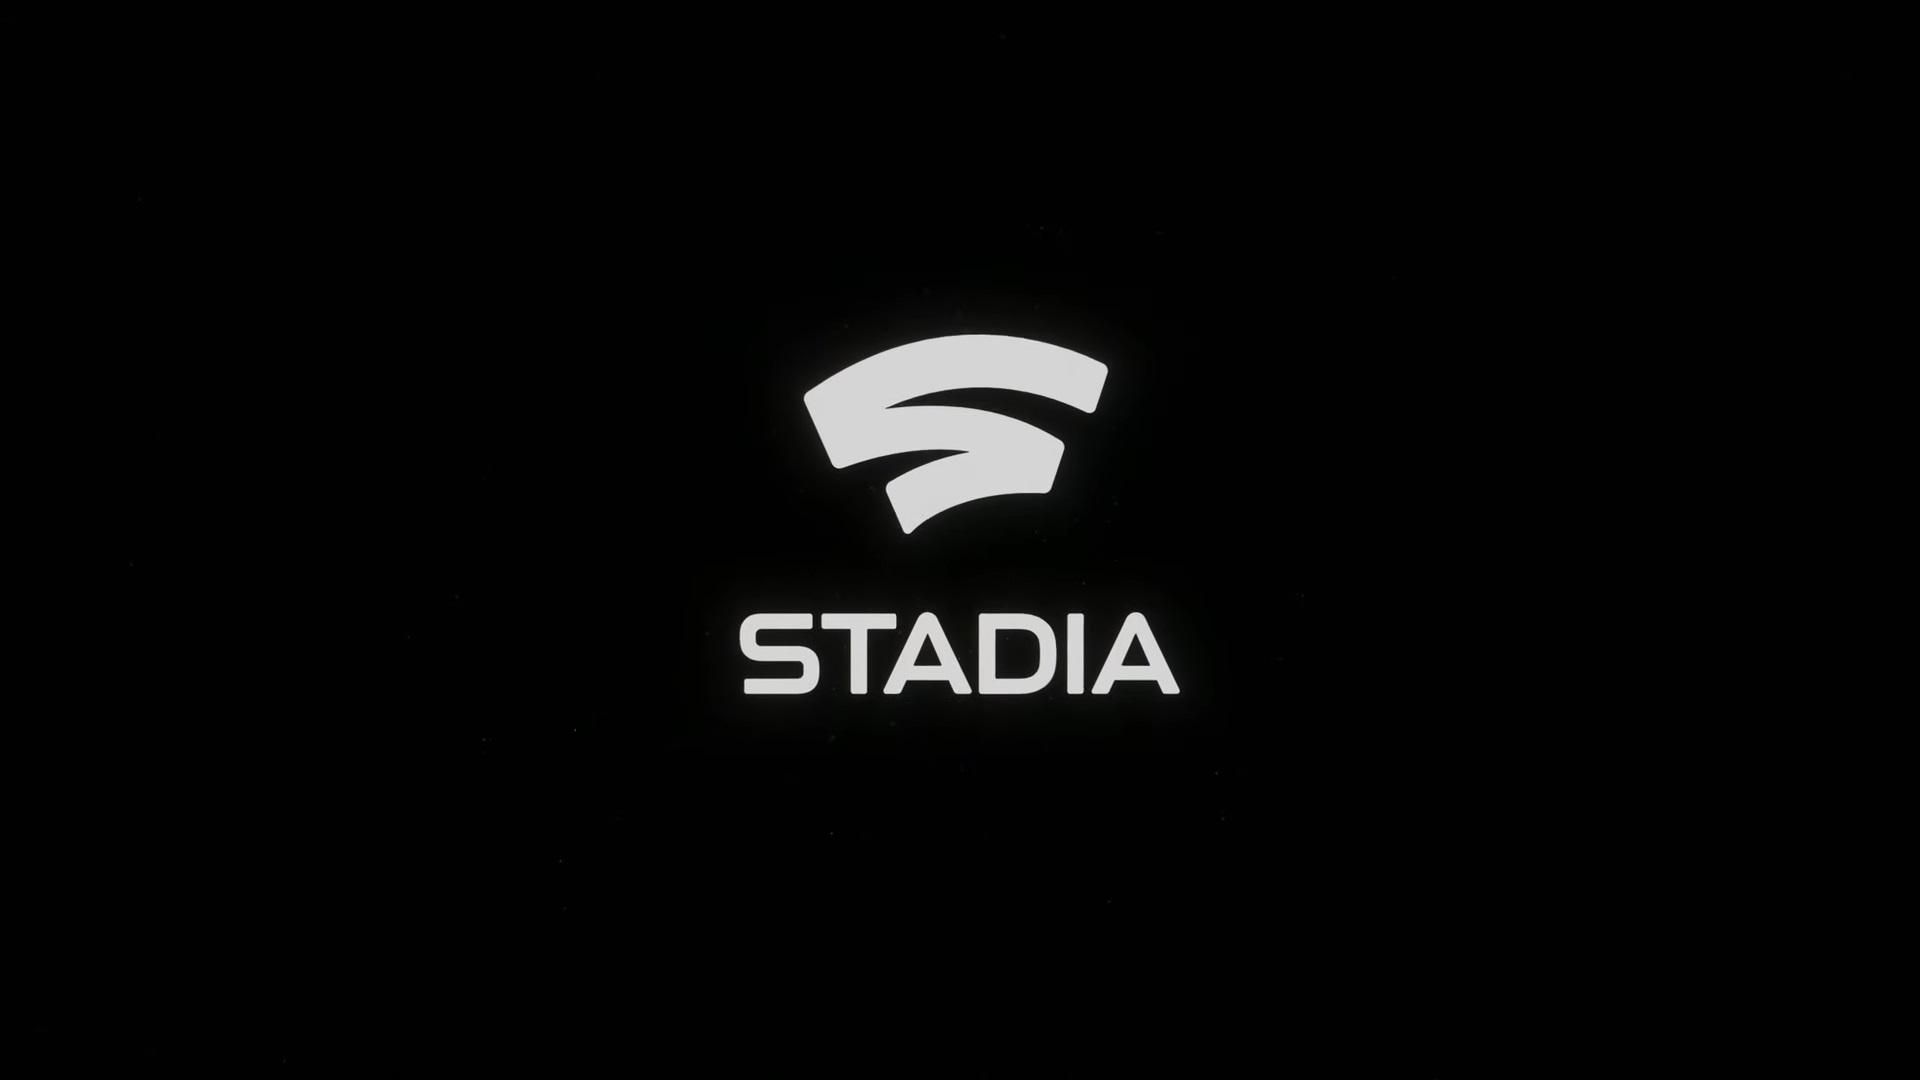 Stadia Google гейминг платформа